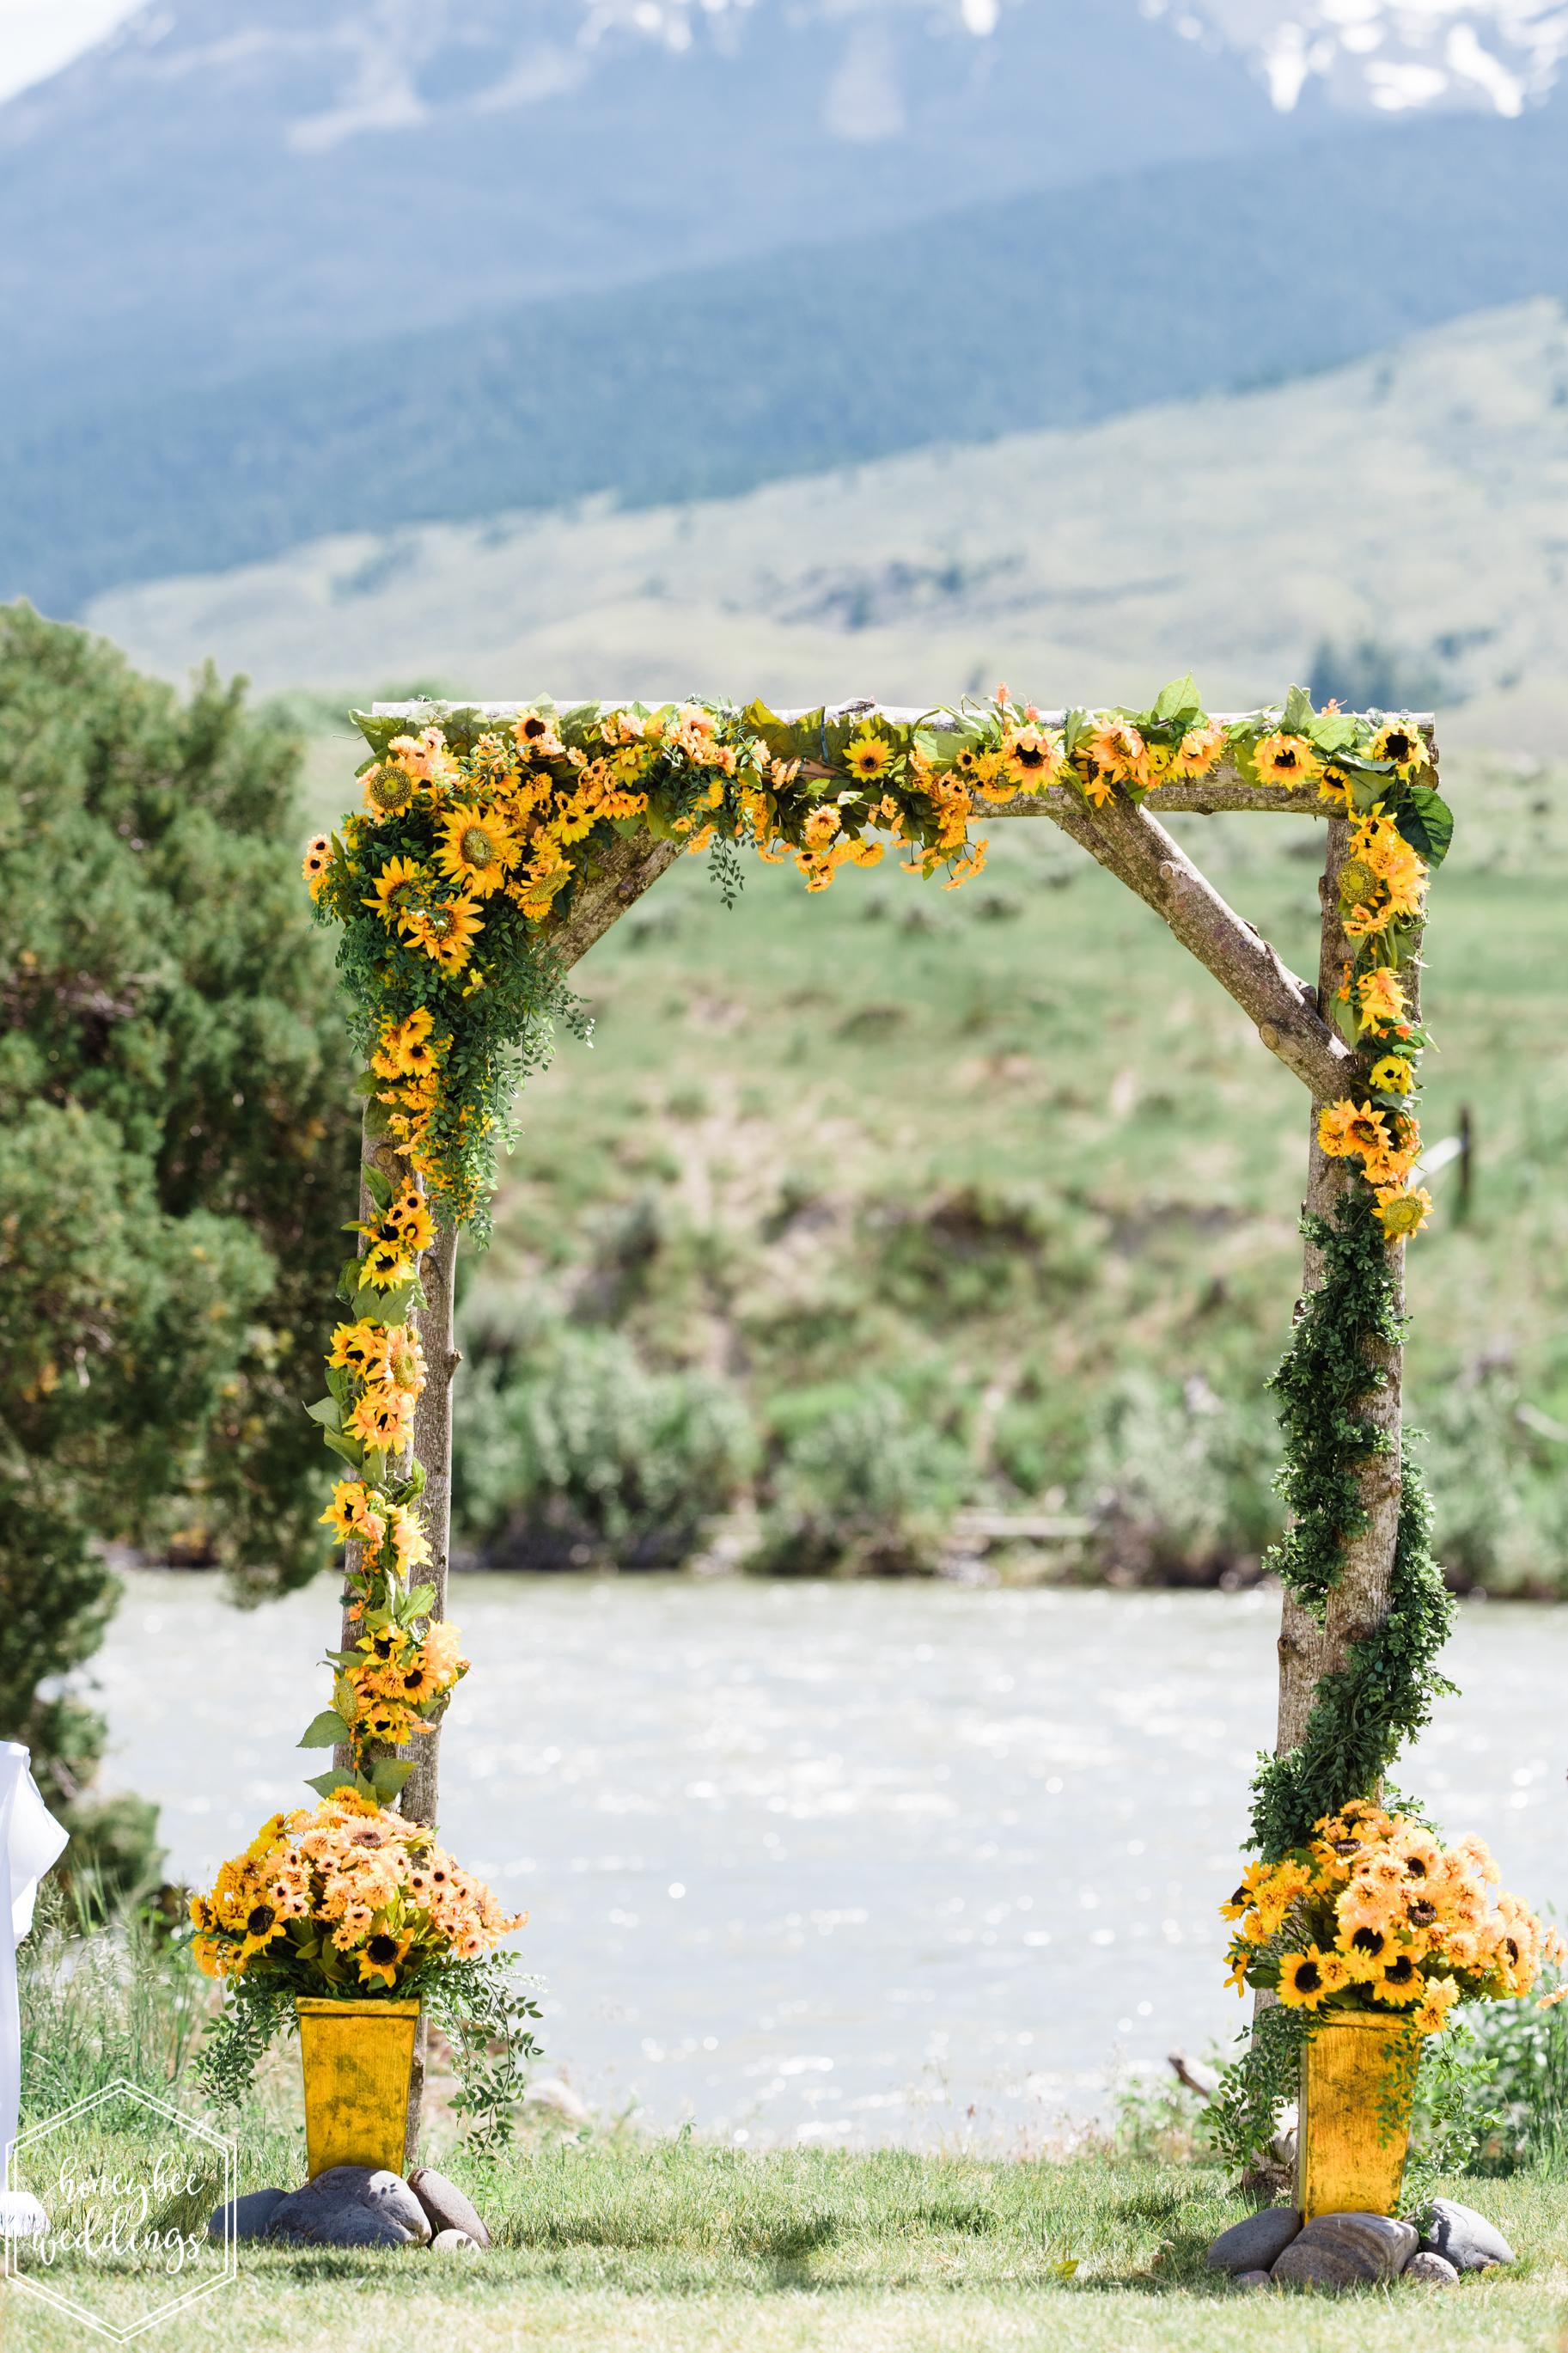 027Yellowstone National Park Wedding_Montana Wedding Photographer_Honeybee Weddings_Shannon & Jonathan_June 29, 2019-1273.jpg